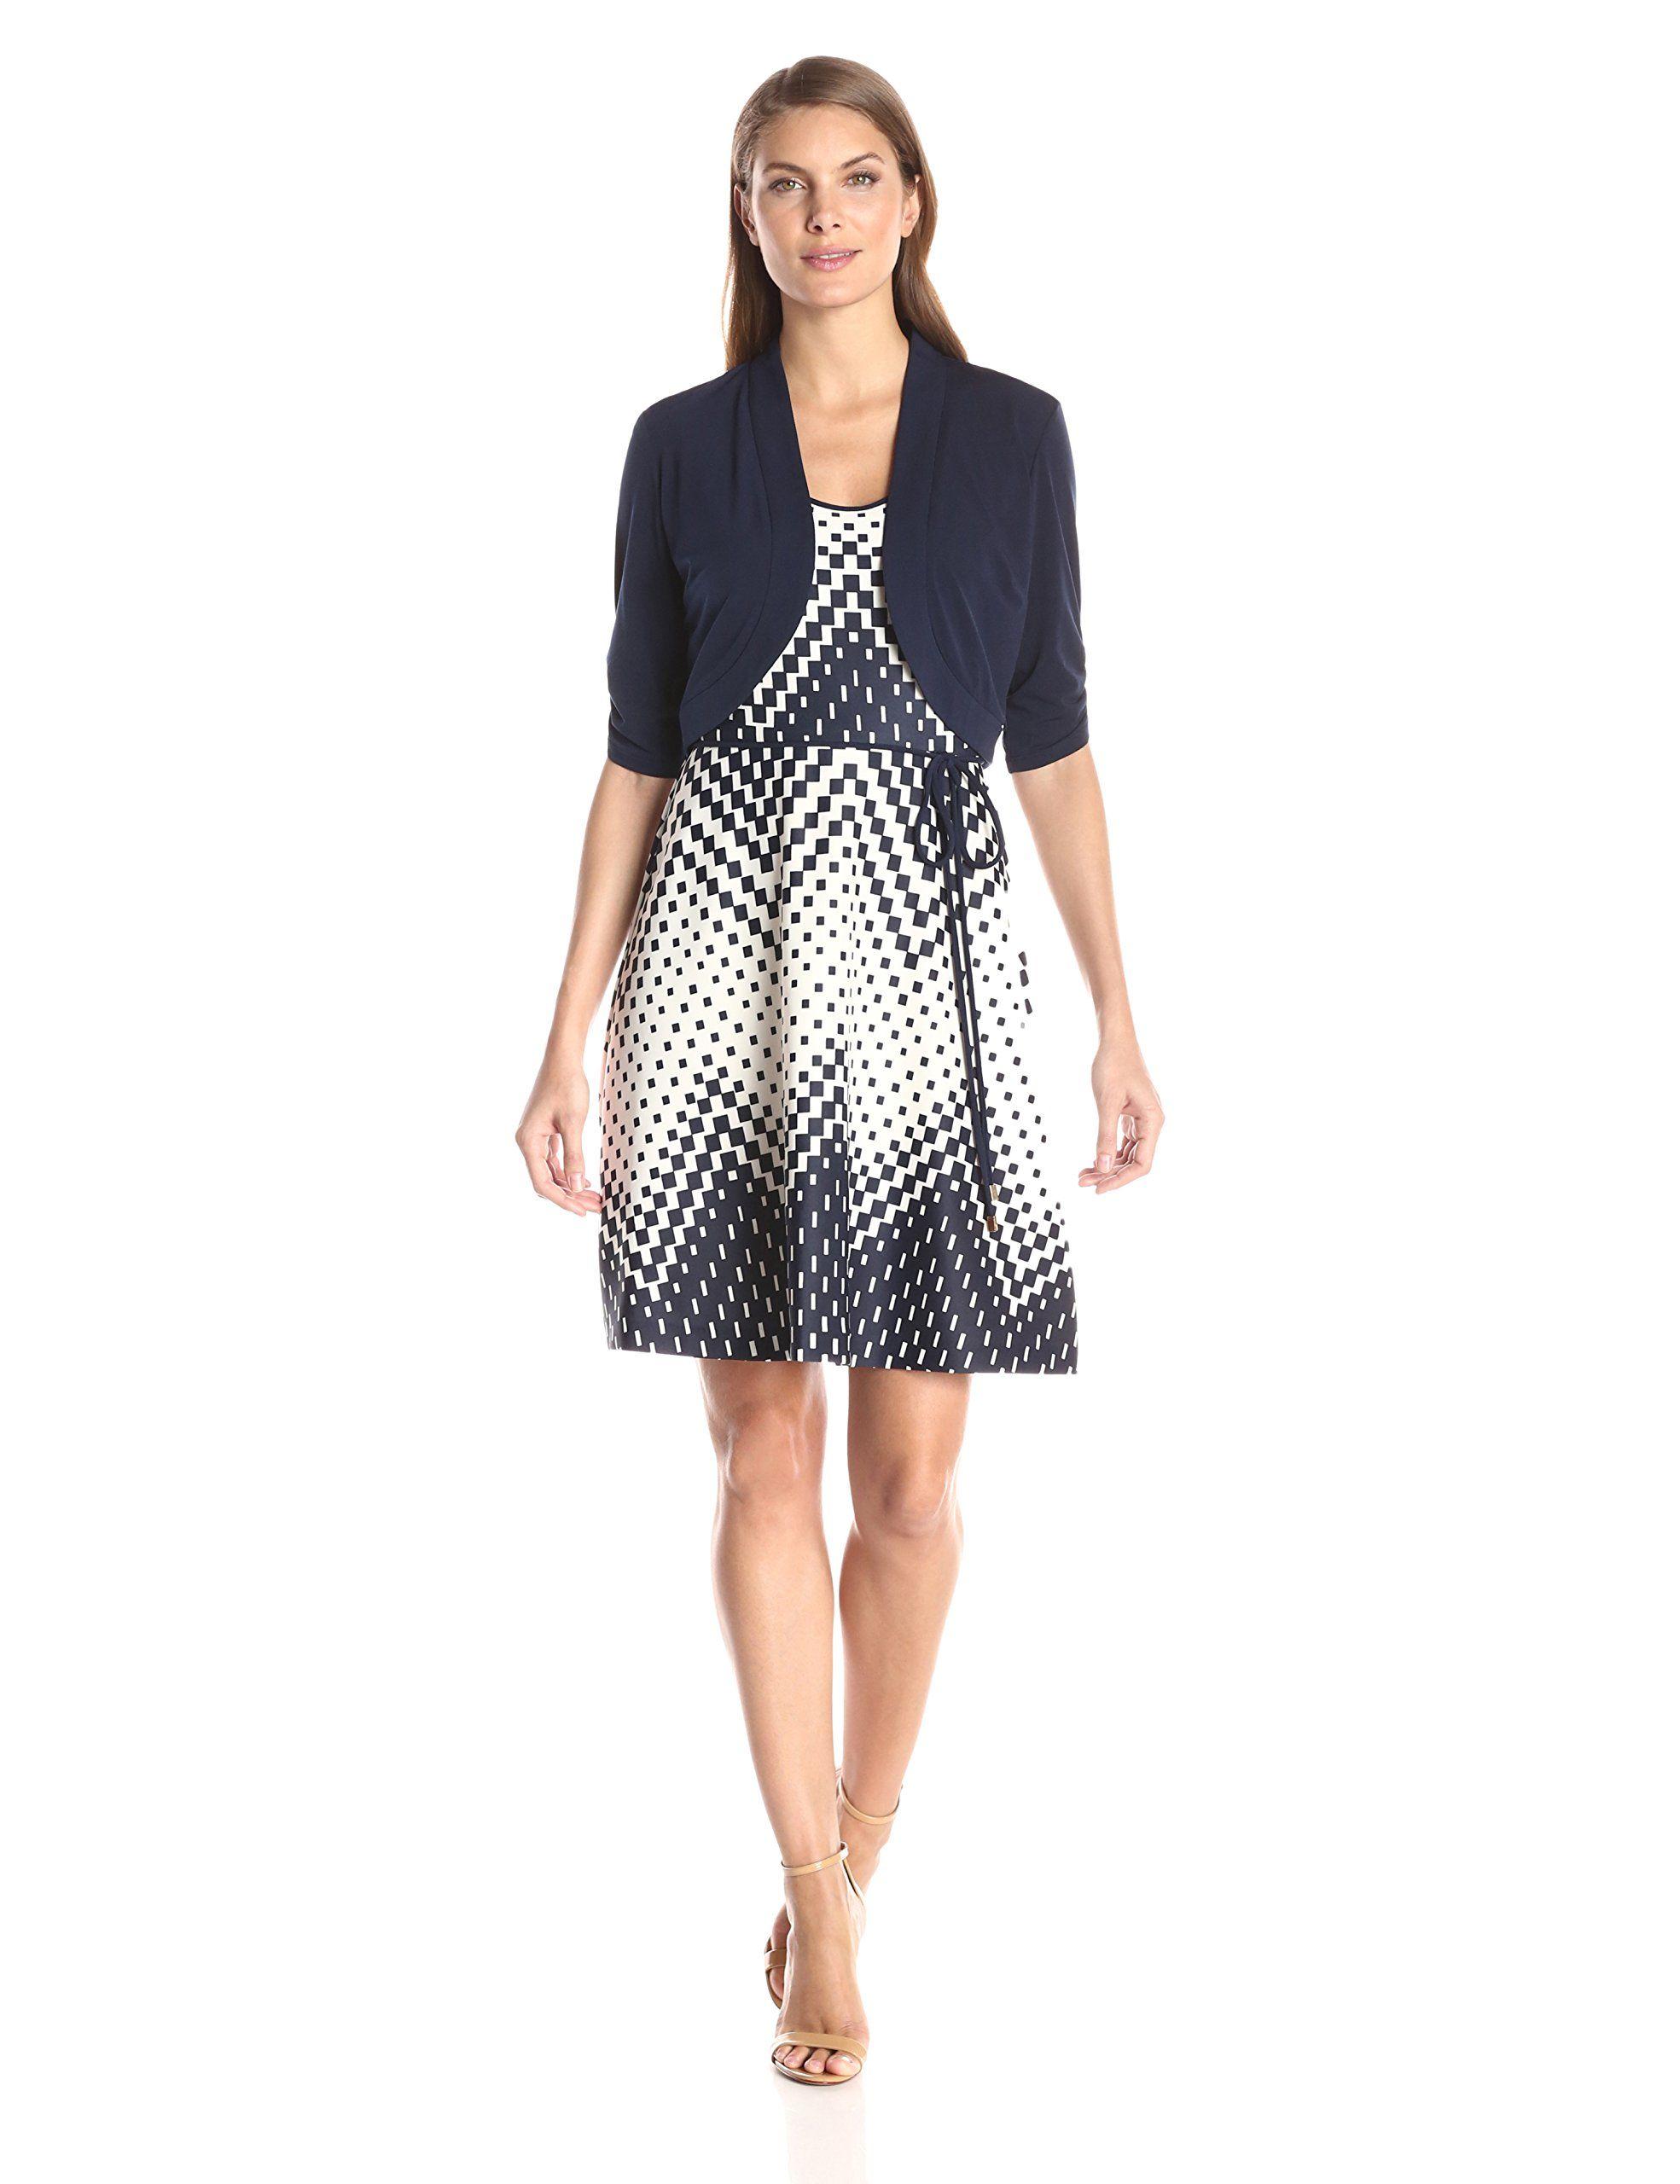 fb3fb00b843 AMAZON ---- Sandra Darren Women s 2 Pc Elbow Sleeve Knit JKT Dress -